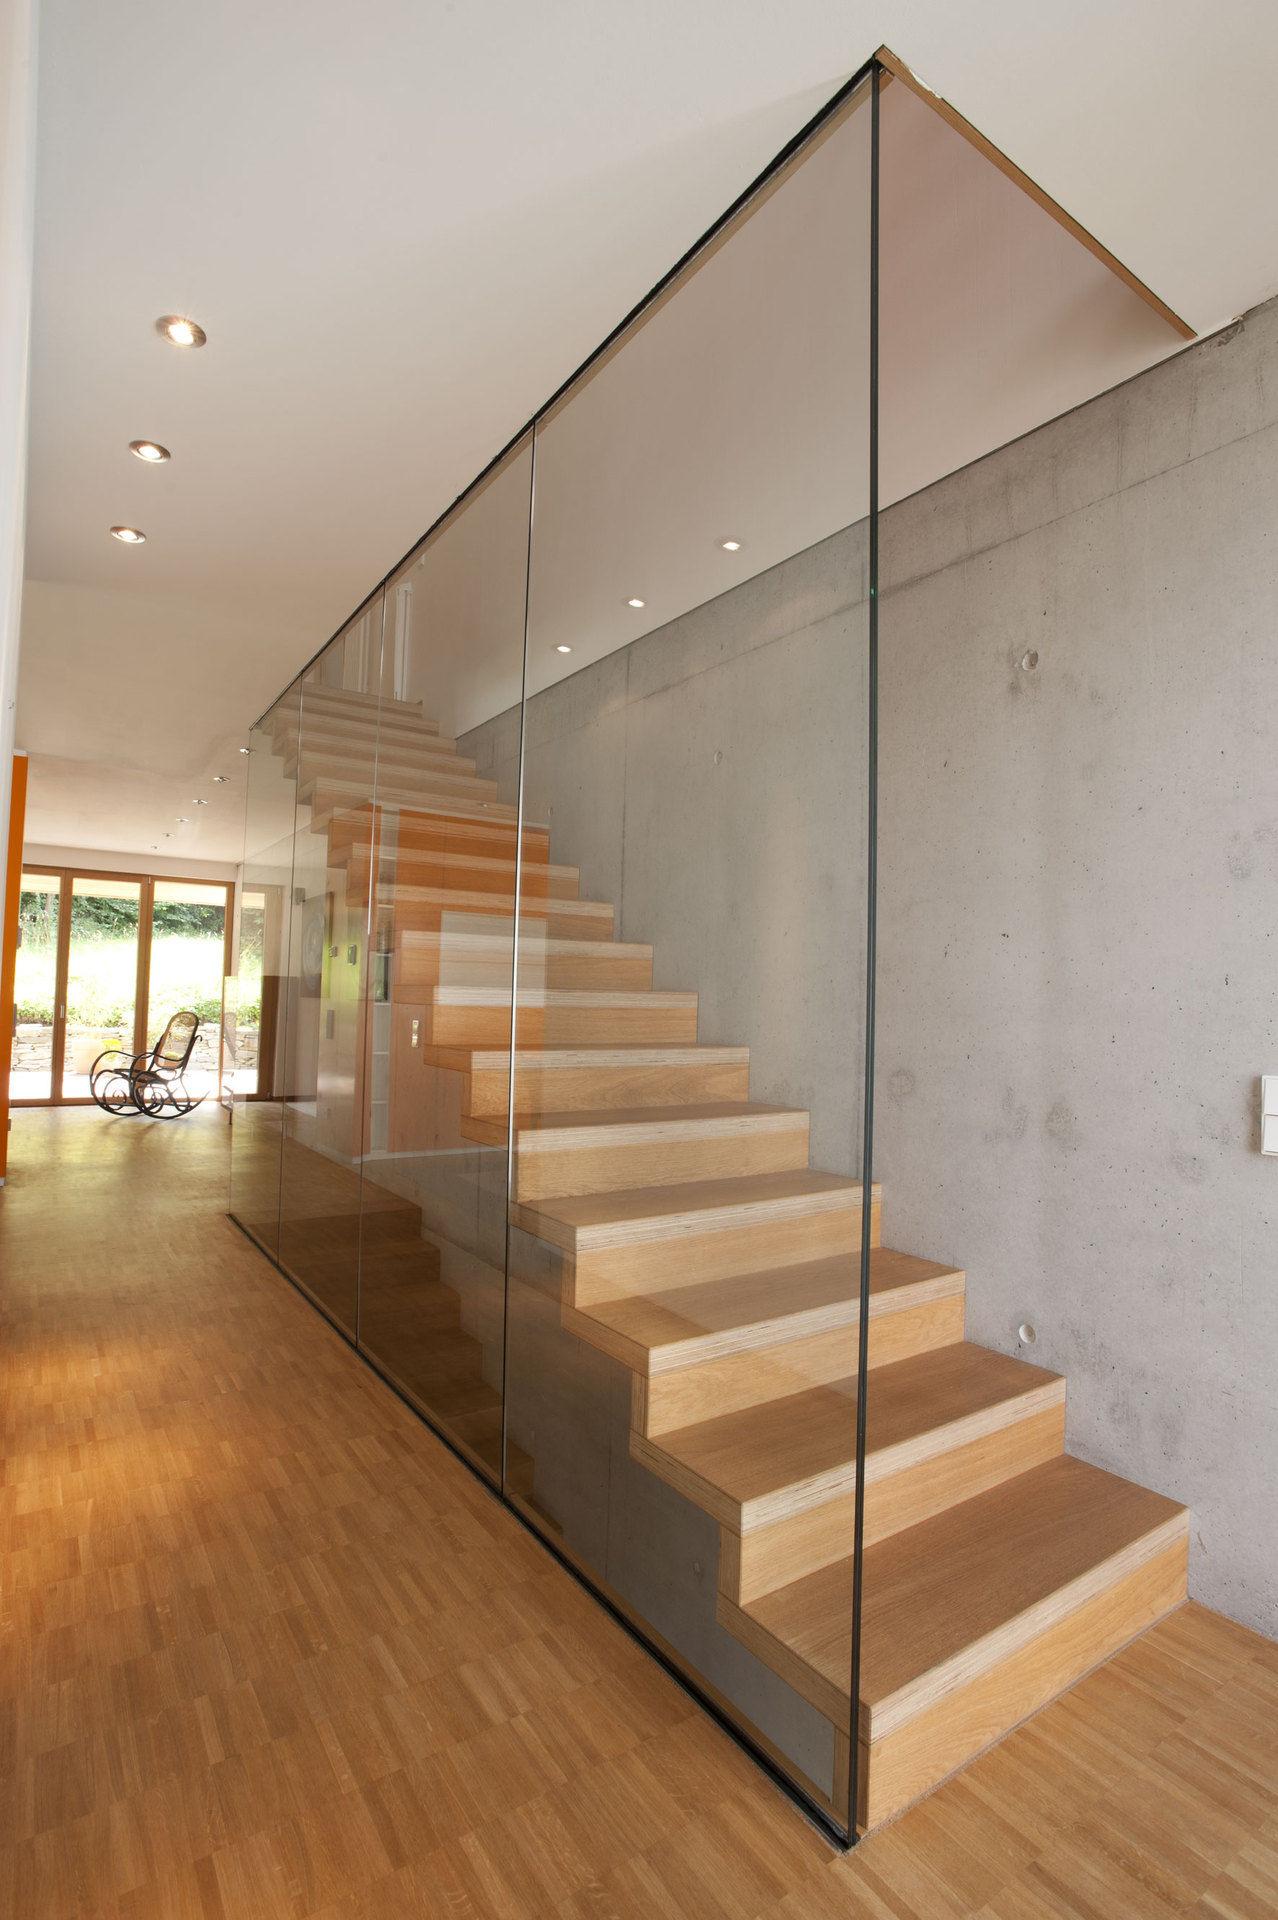 Faltwerktreppe Aus Holz In Modernem Treppenhaus Bauemotion De